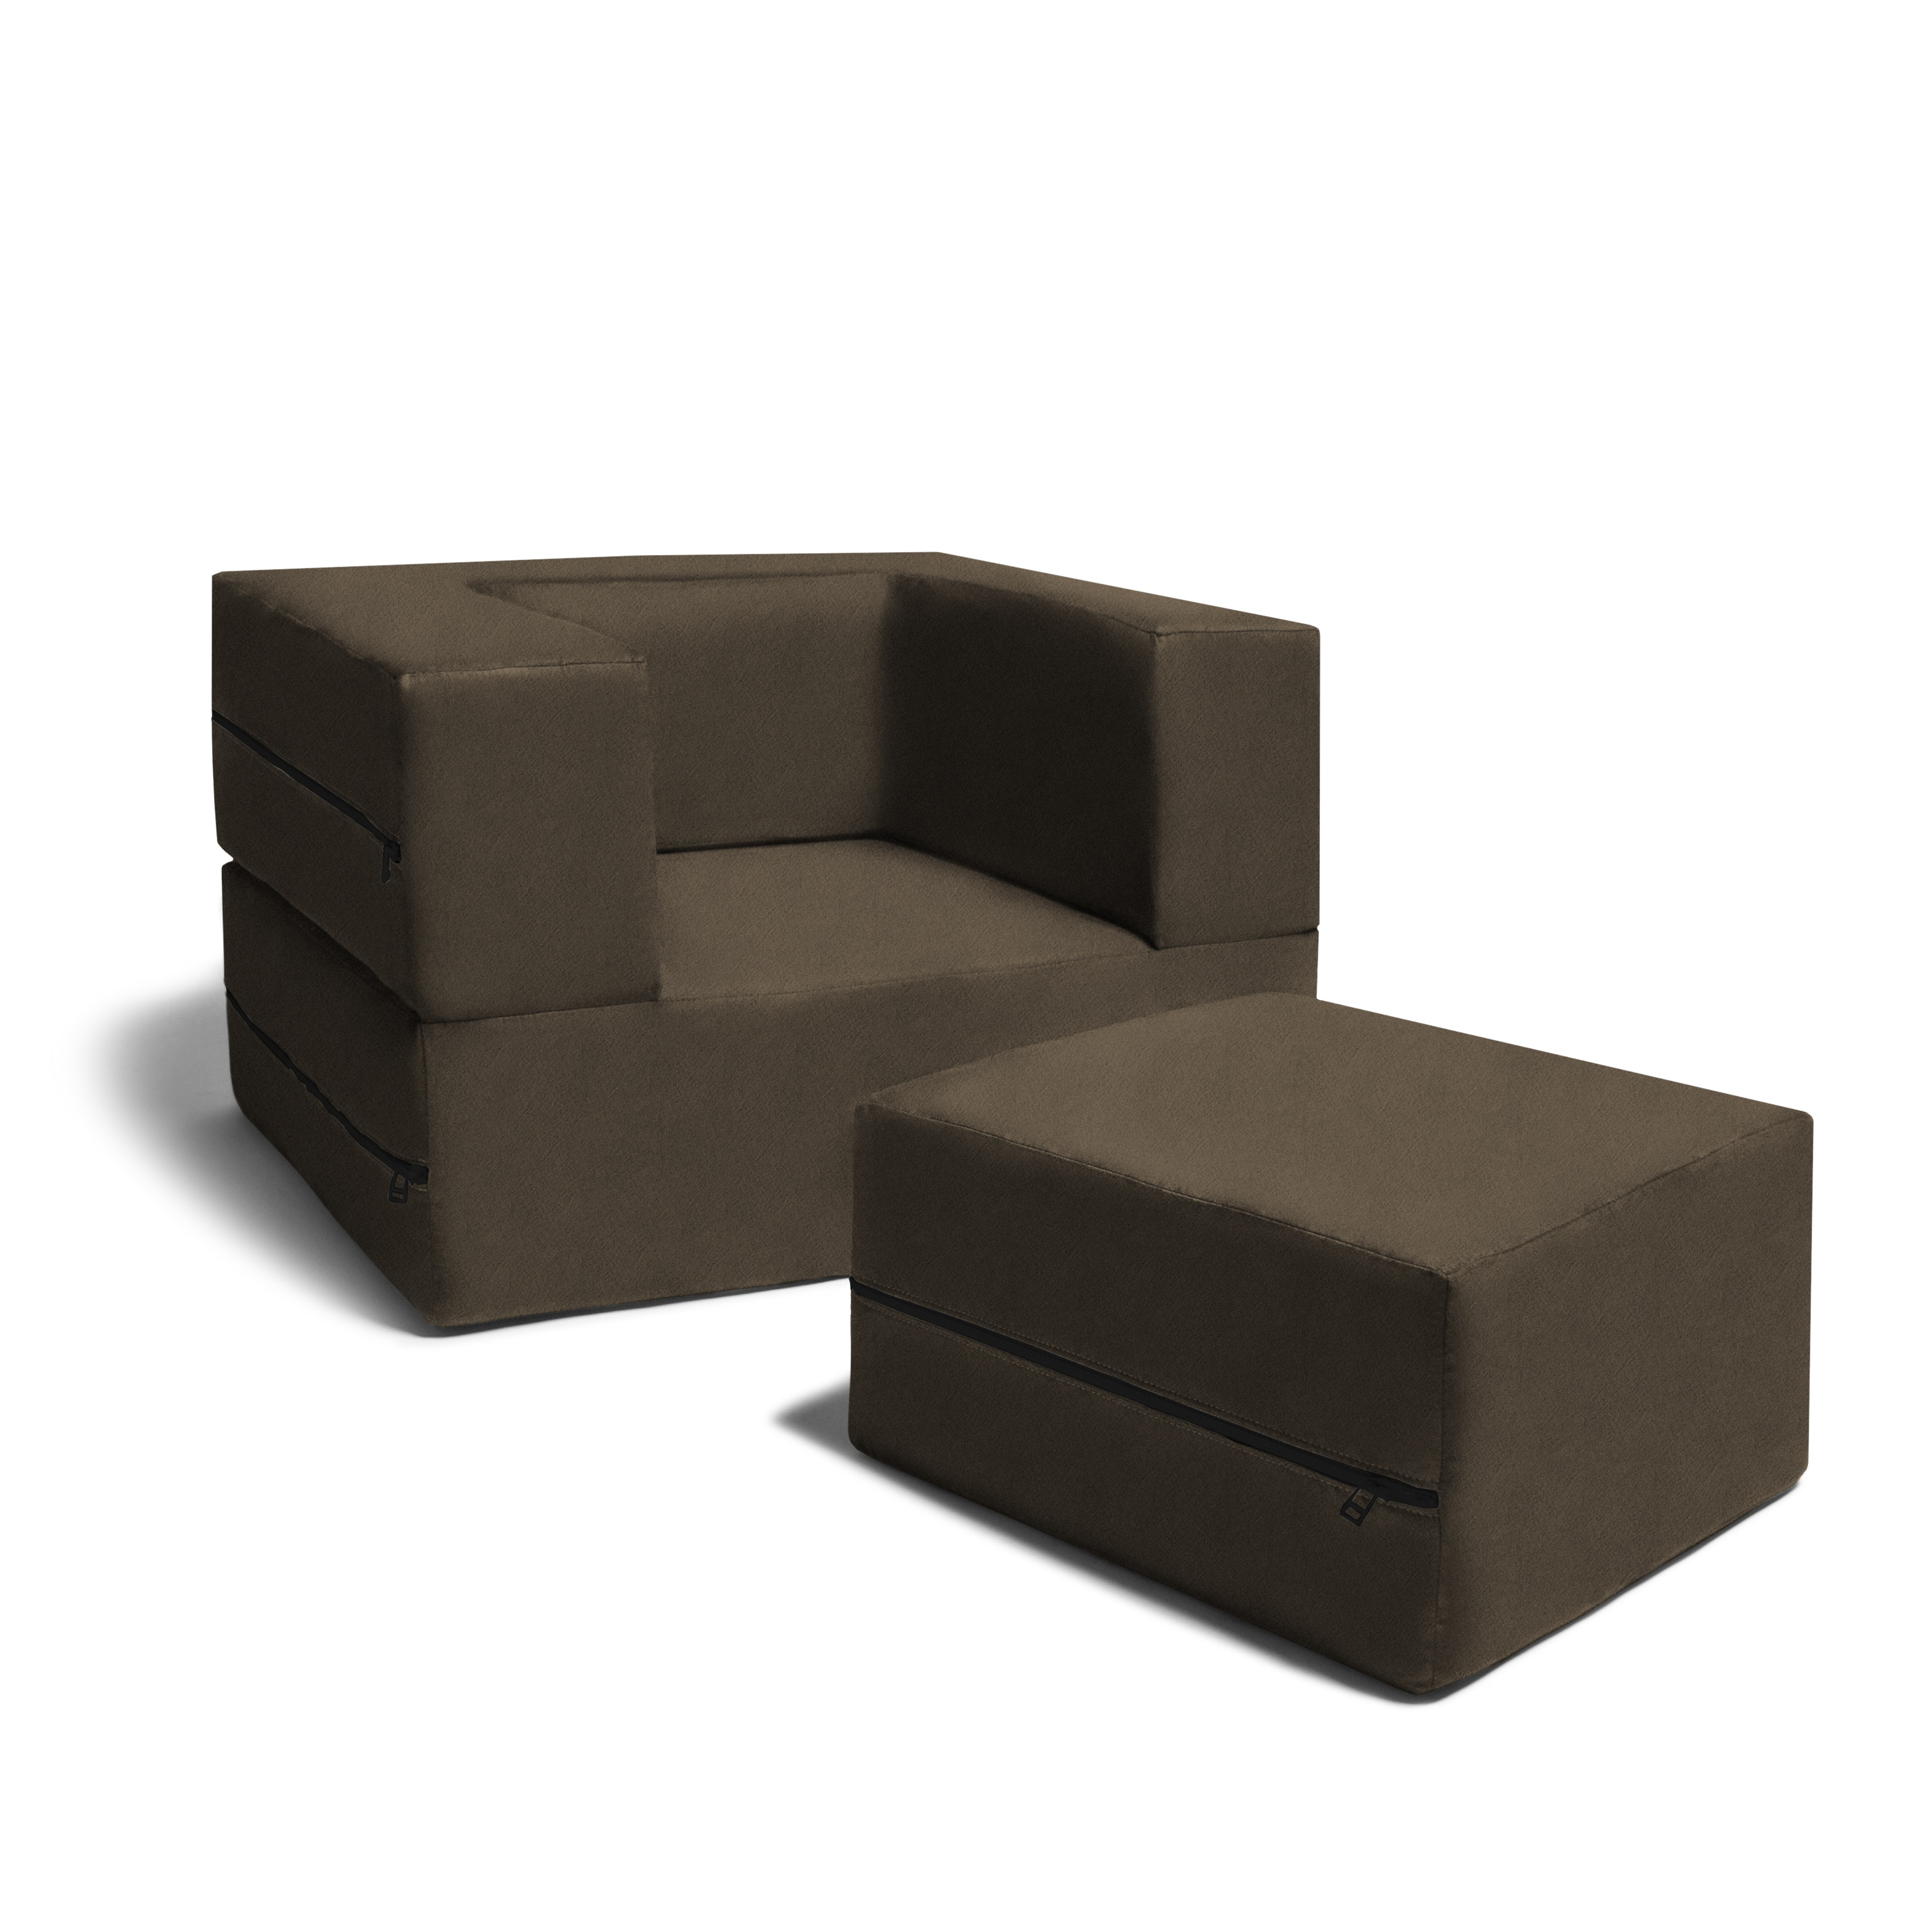 Remarkable Jaxx Big Kids Convertible Sleeper Chair Ottoman Creativecarmelina Interior Chair Design Creativecarmelinacom